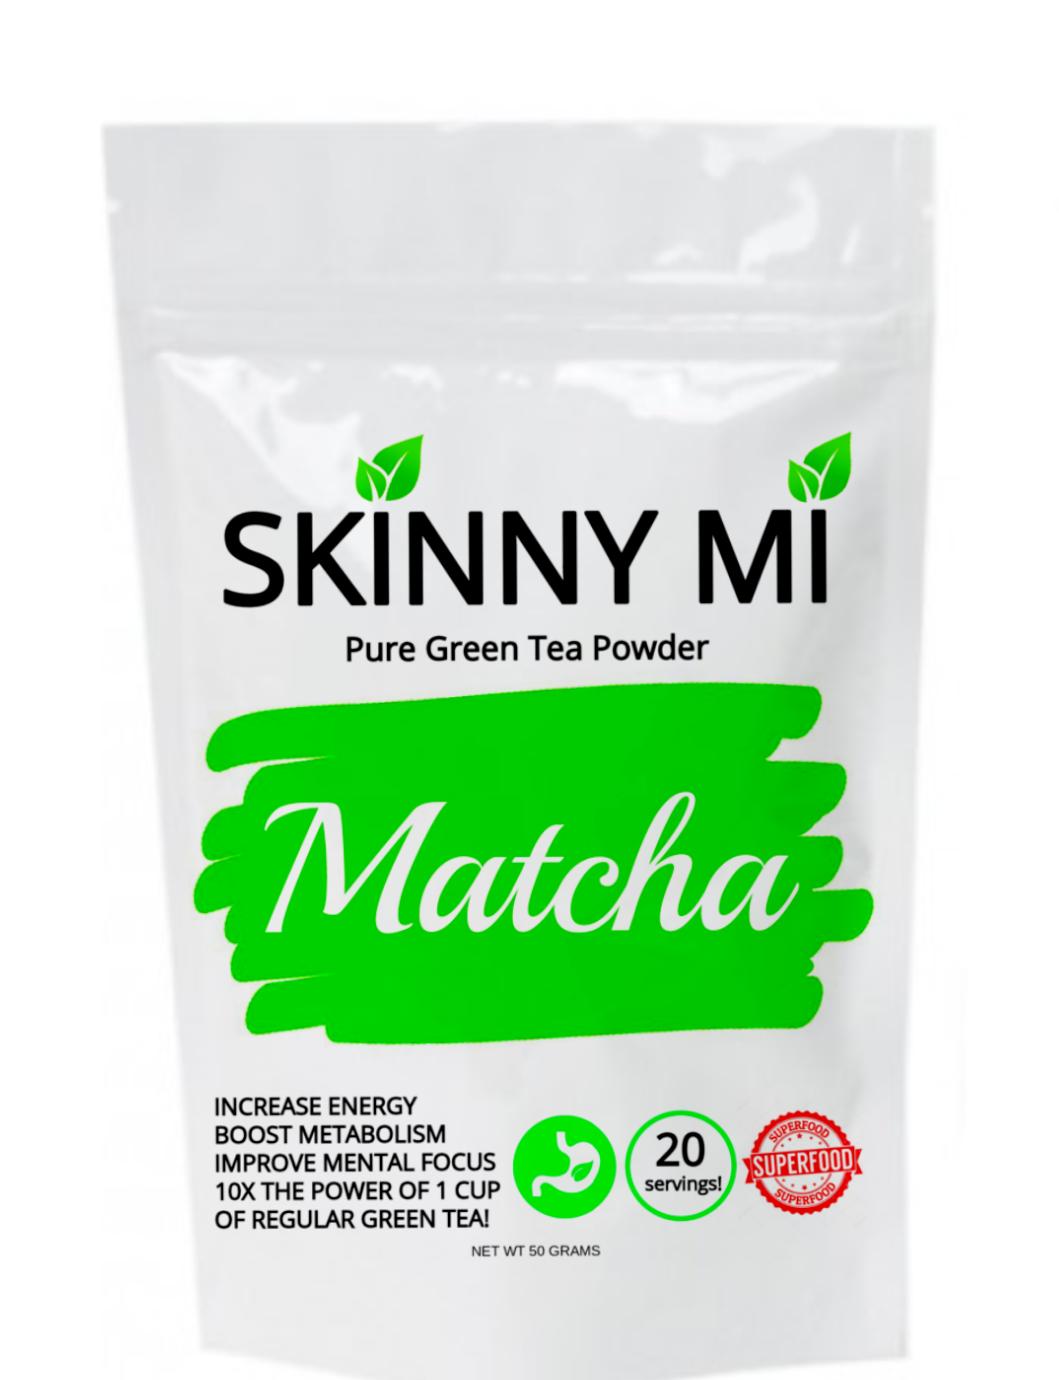 Skinny Mi MATCHA Green Tea Powder - 100% Pure Matcha for wei